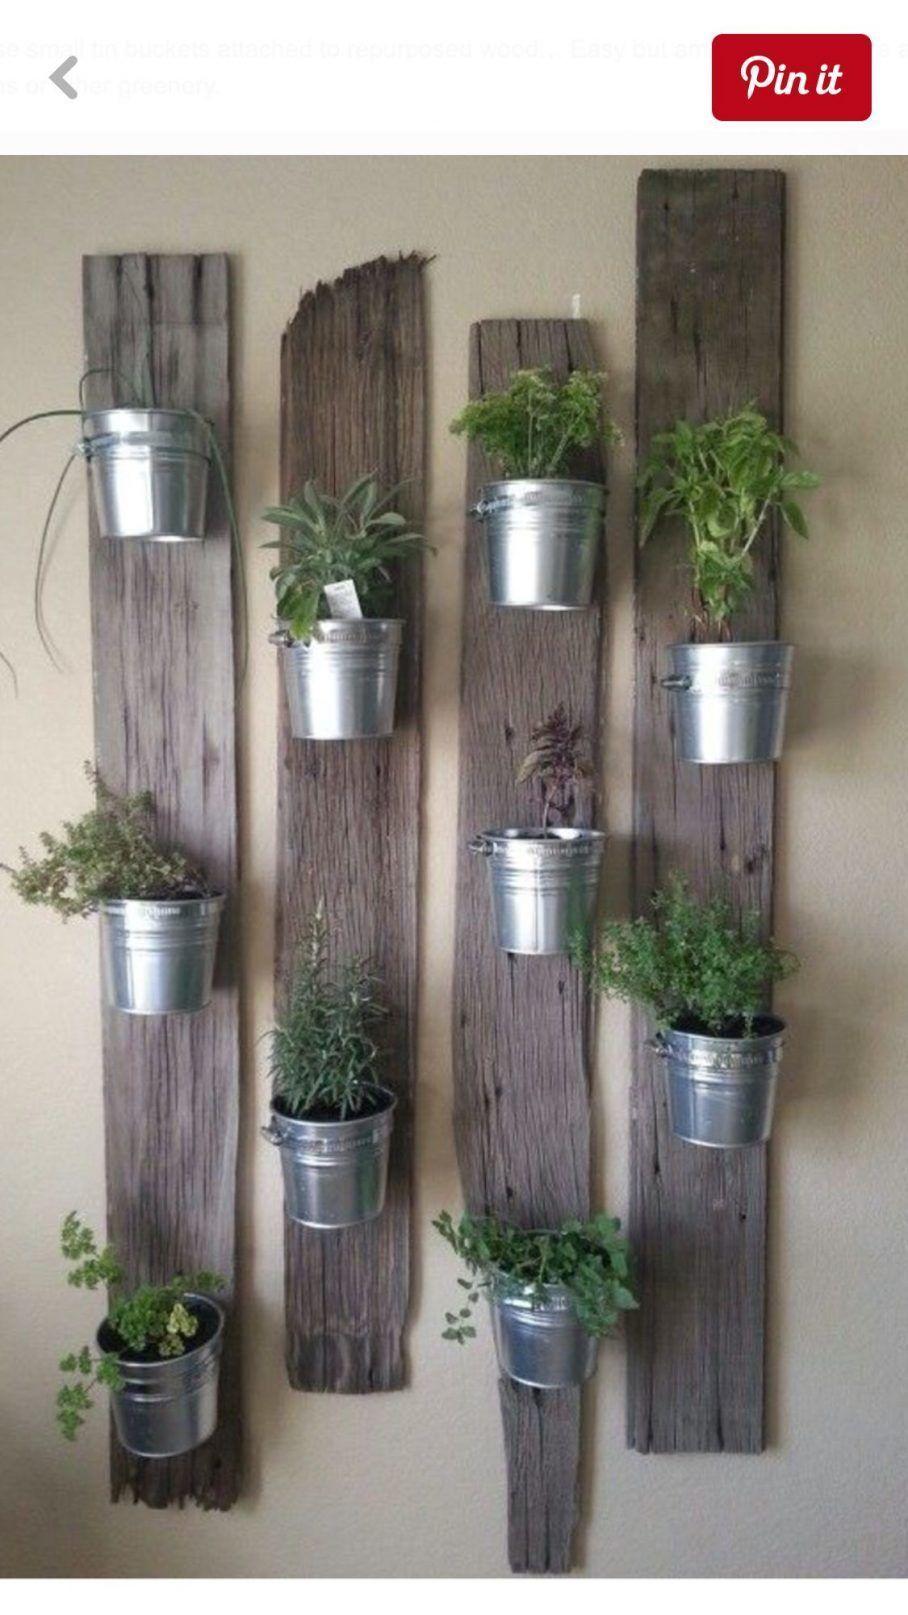 uneven wood panels and metal pails for indoor herb planter on indoor herb garden diy apartments living walls id=85921